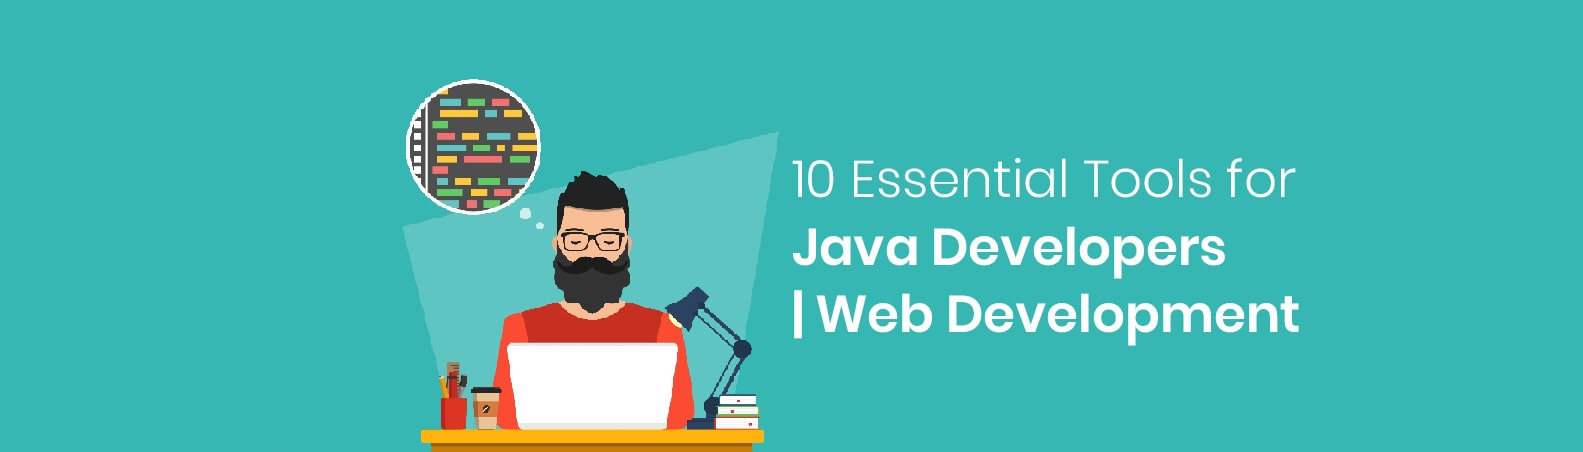 10 Essential Tools for Java Developers   Web Development